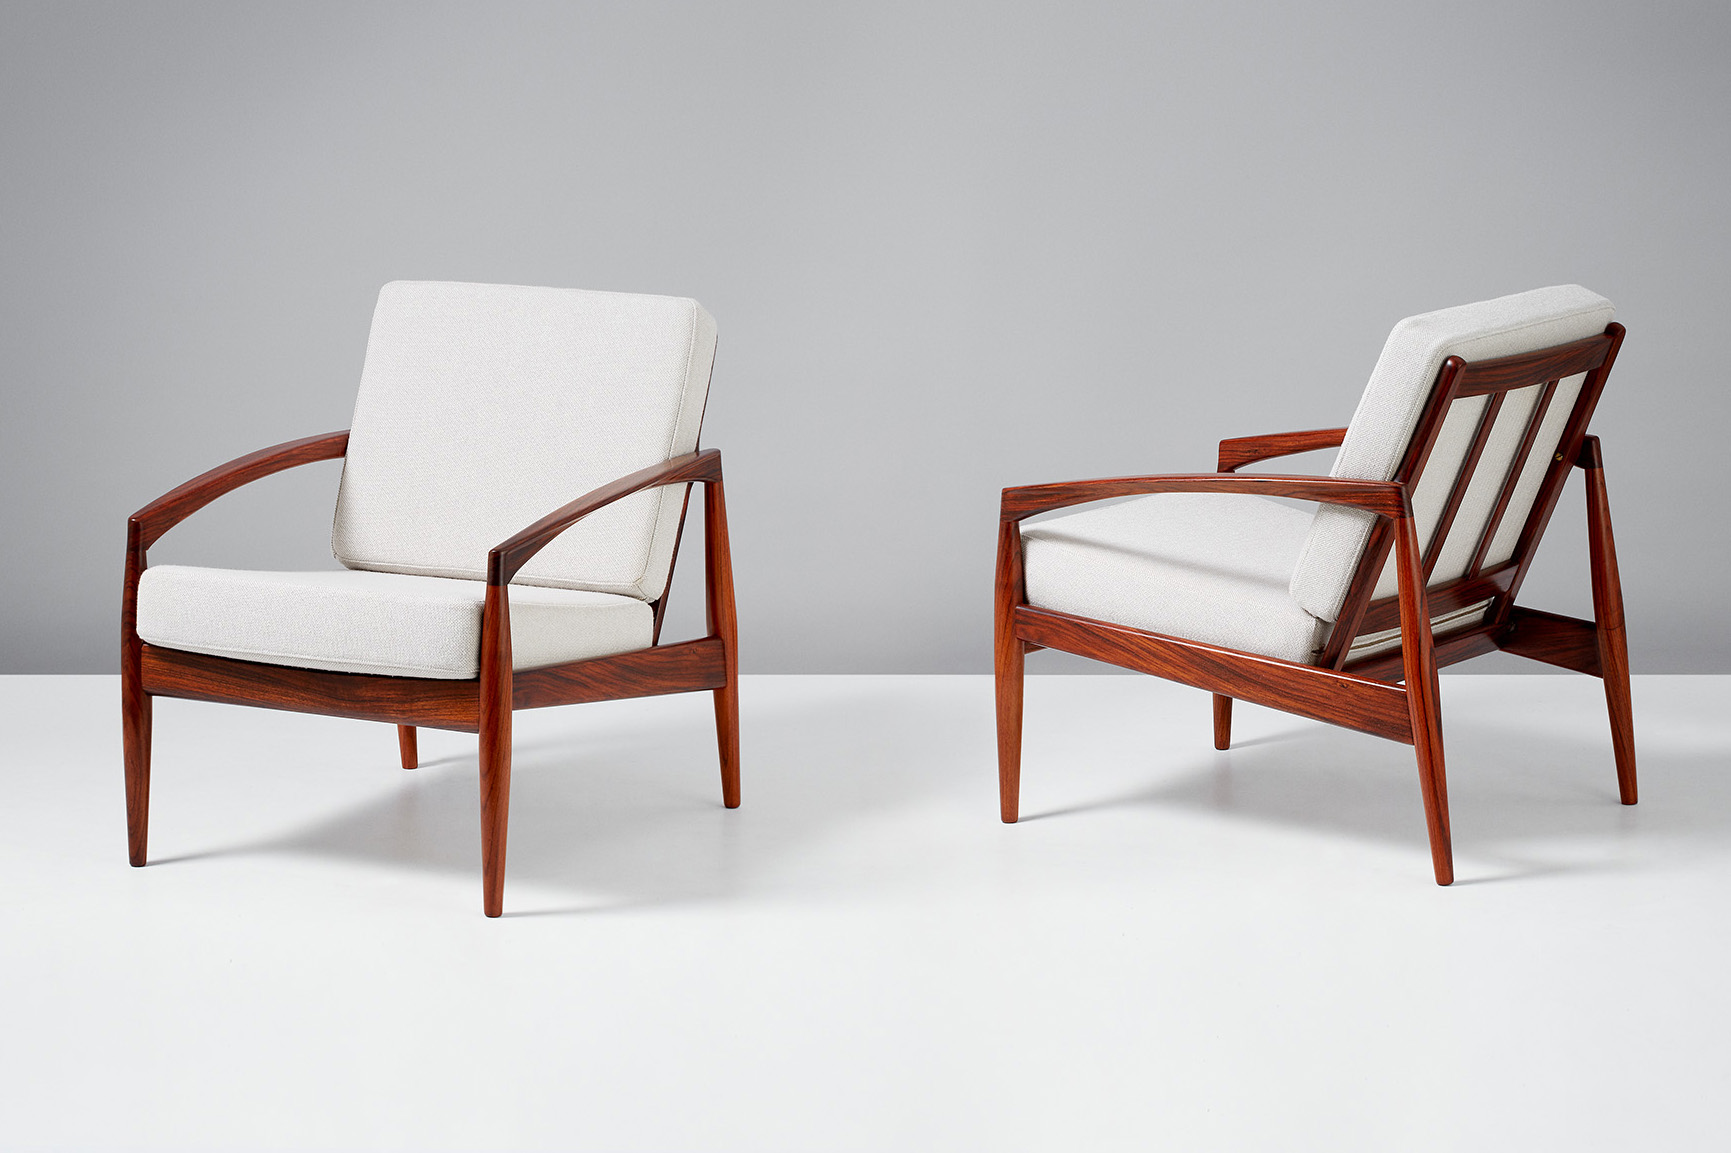 Kai Kristiansen Paper Knife Lounge Chairs, Rosewood